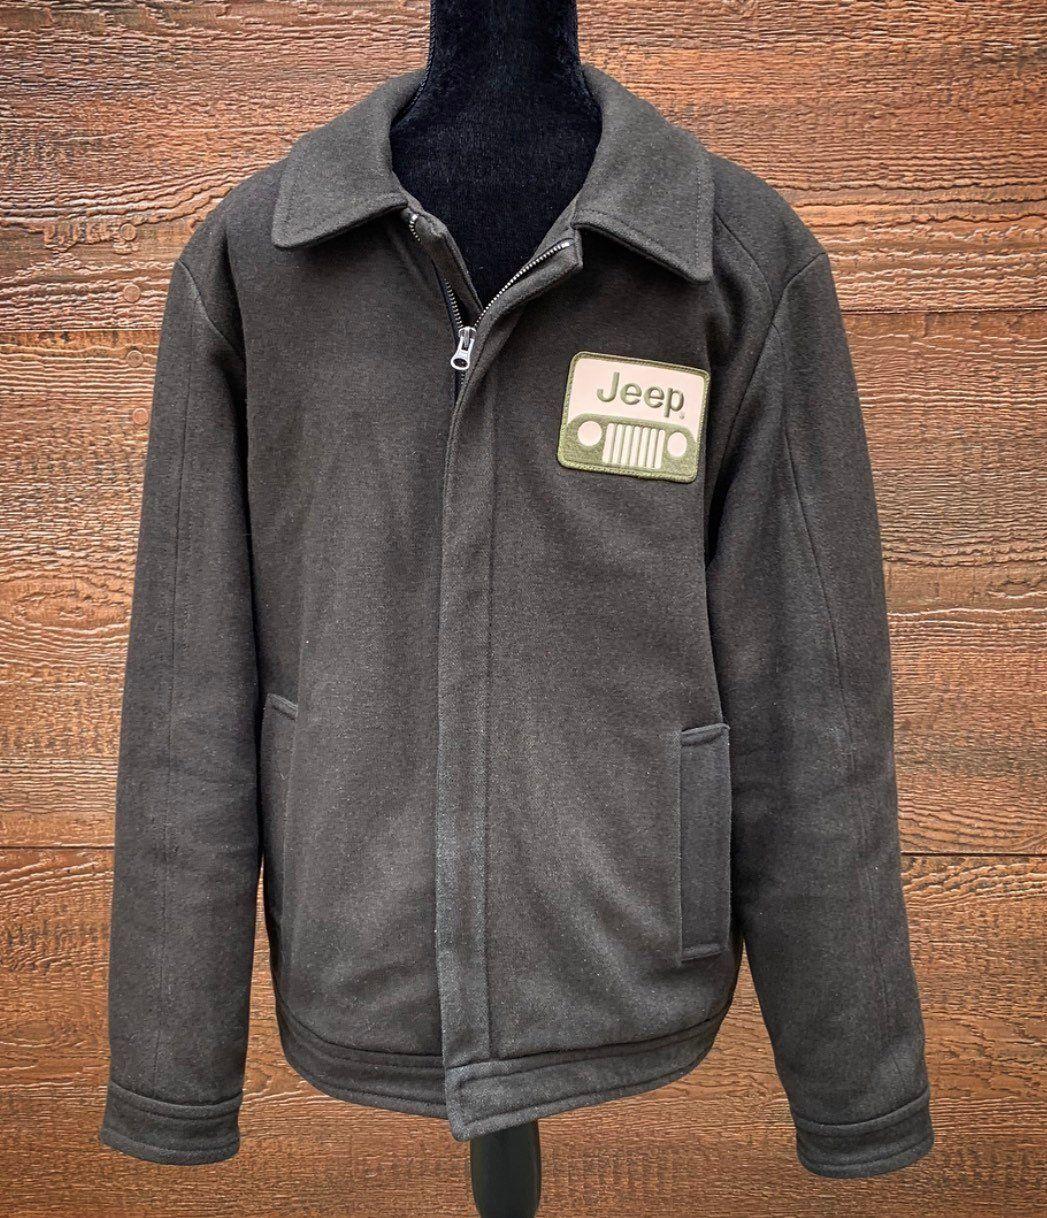 03397907b JEEP Vintage 80s Military Green Wool Bomber Jacket Men's Medium in ...